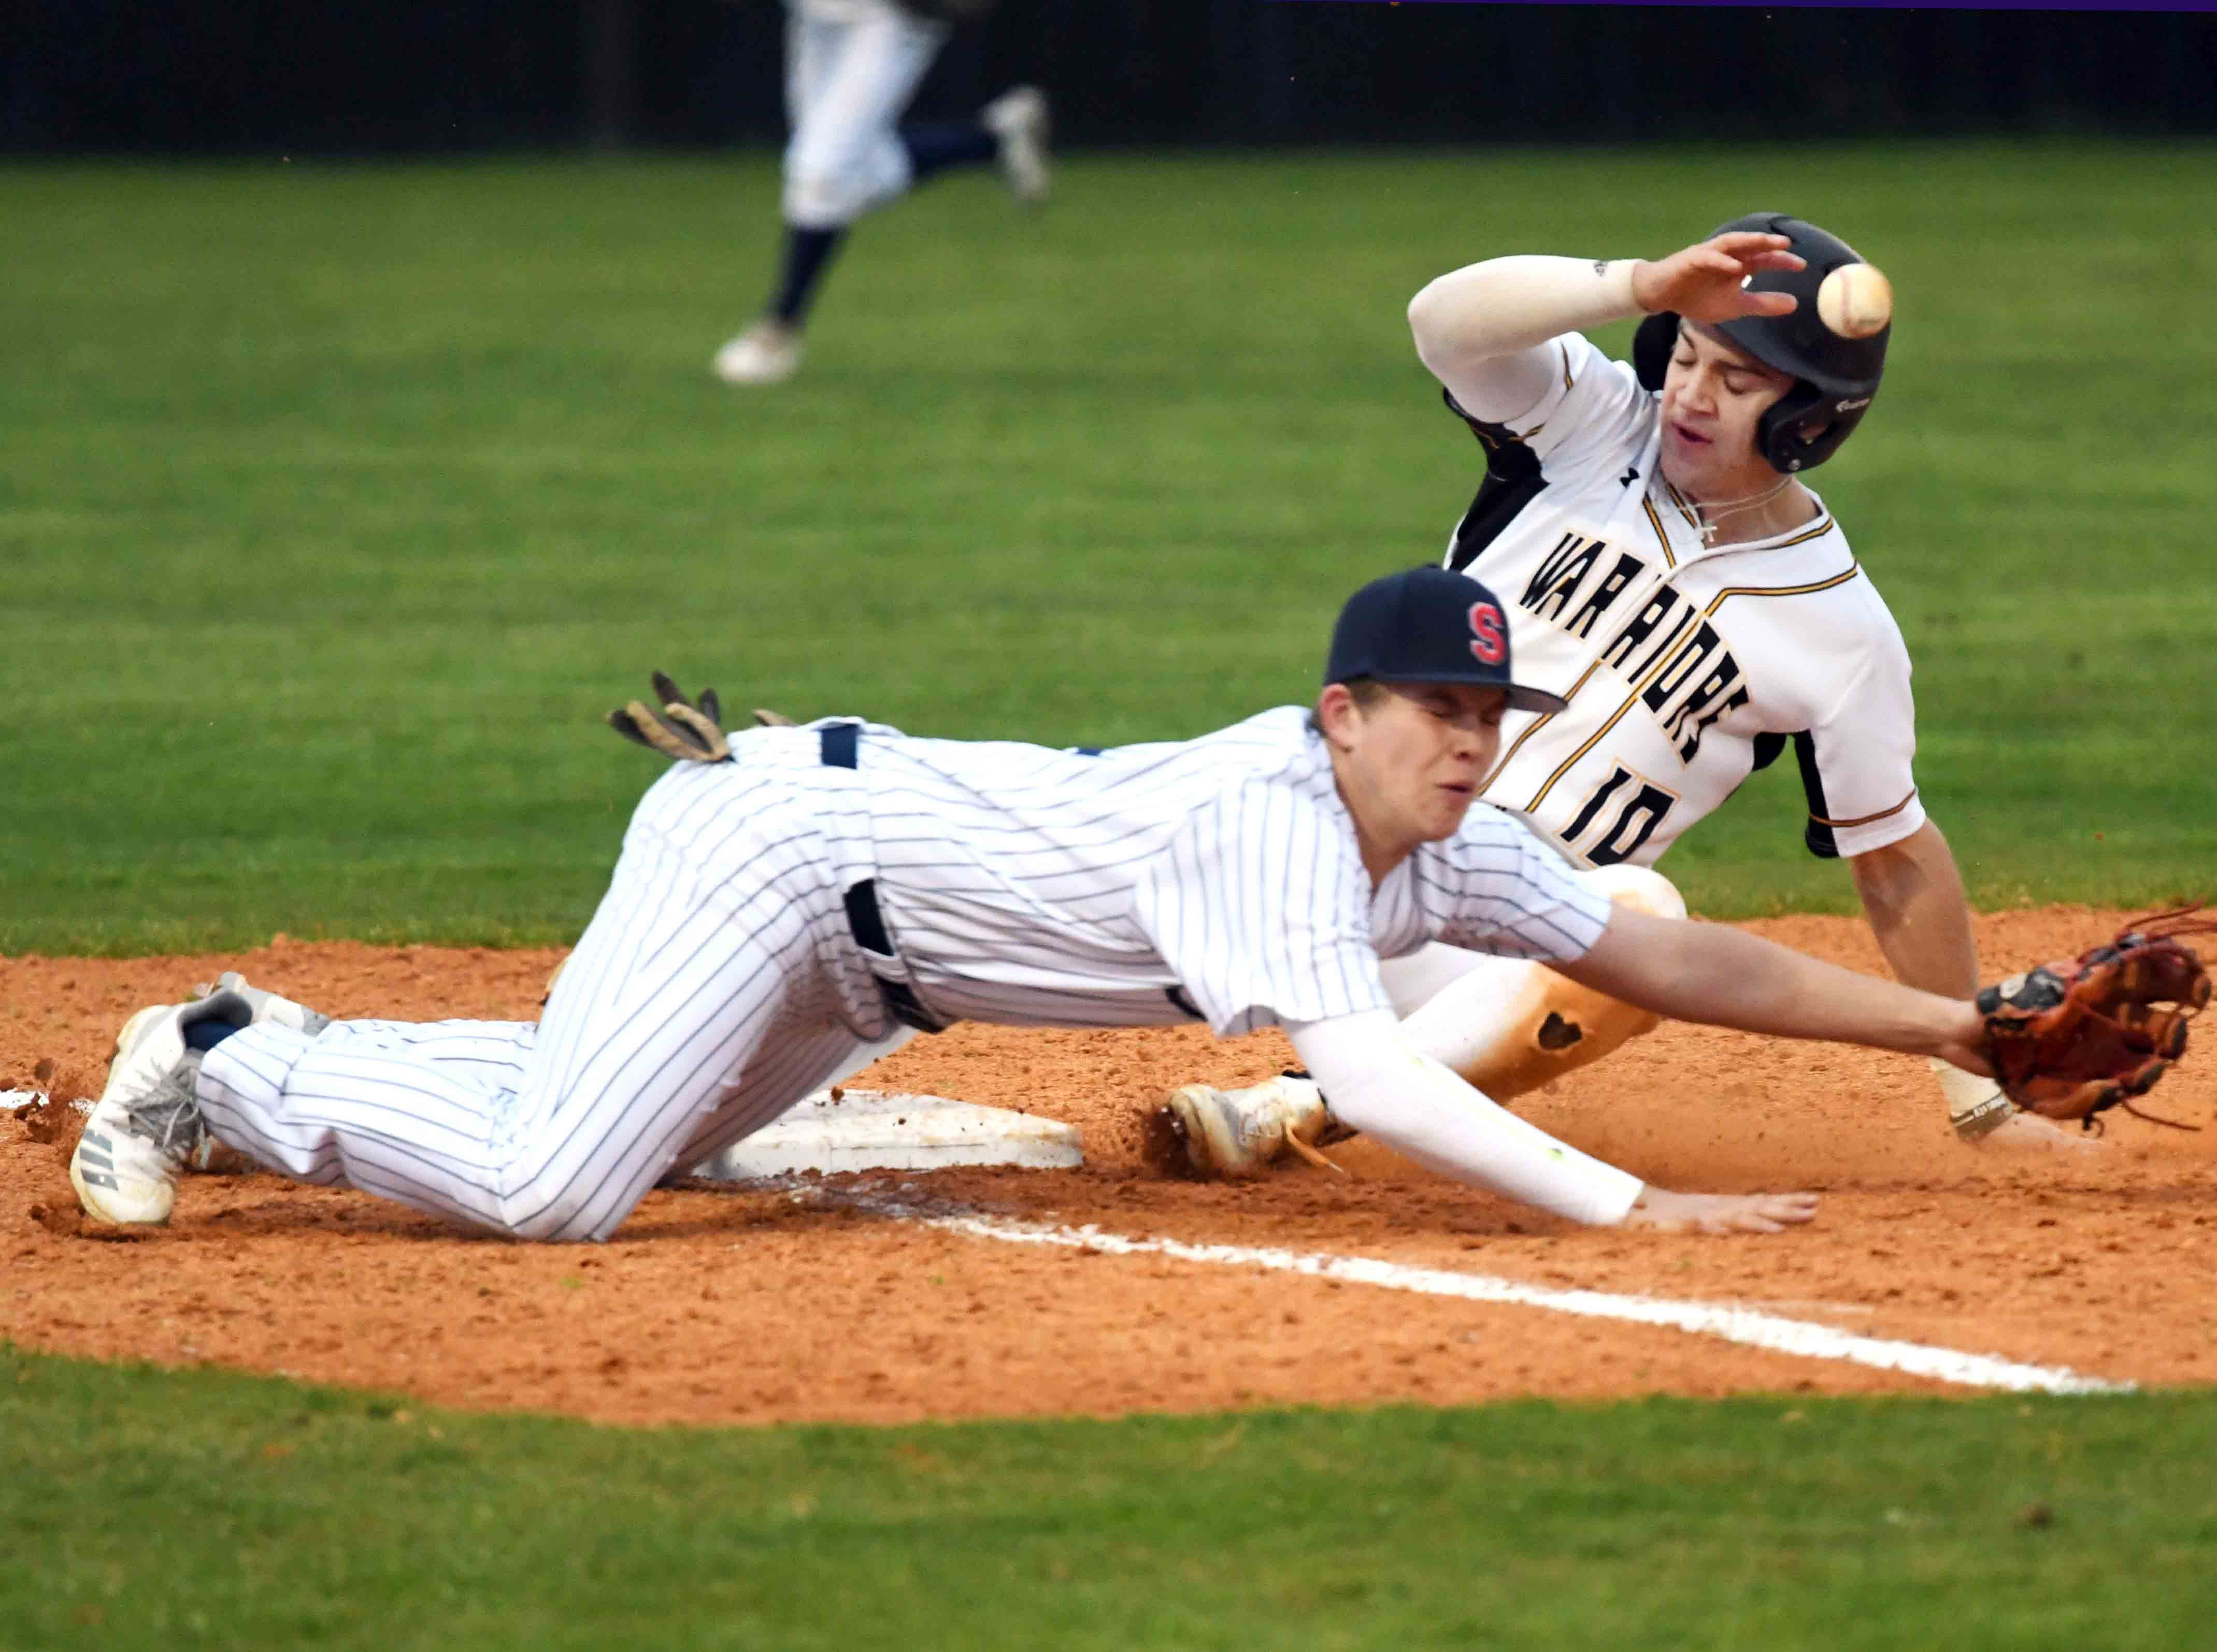 Oak Grove senior John Rhys Plumlee slides into third base  in their season opener against Seminary in Hattiesburg on Monday, February 18, 2019.